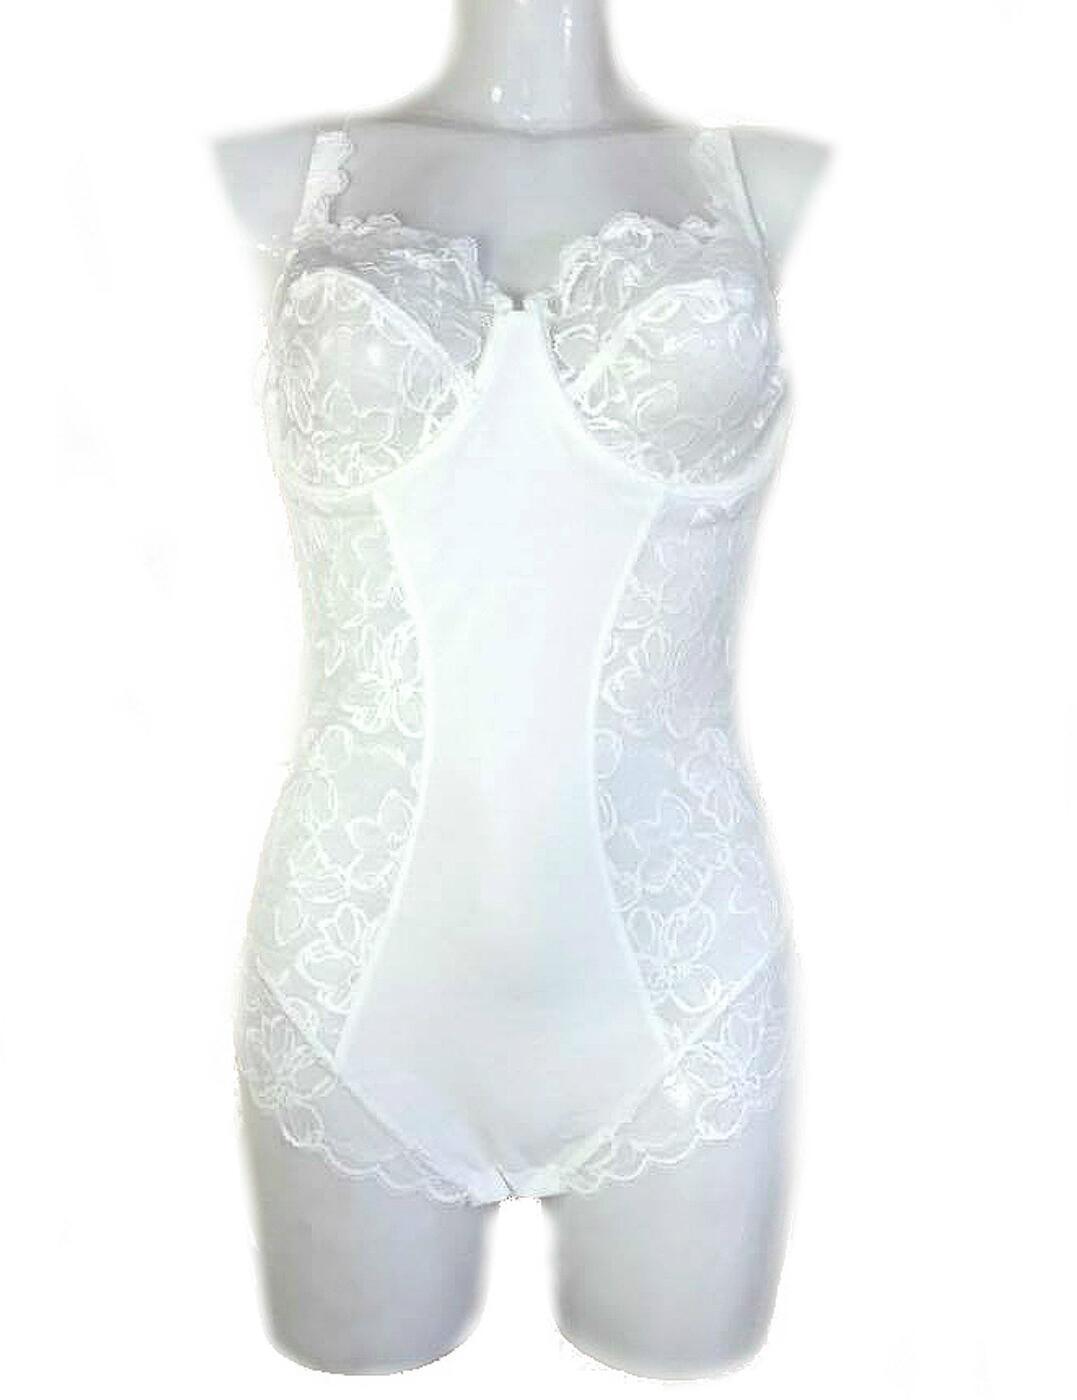 WFAFA561 Wacoal Celeste Lace Body - AFA561 Ivory